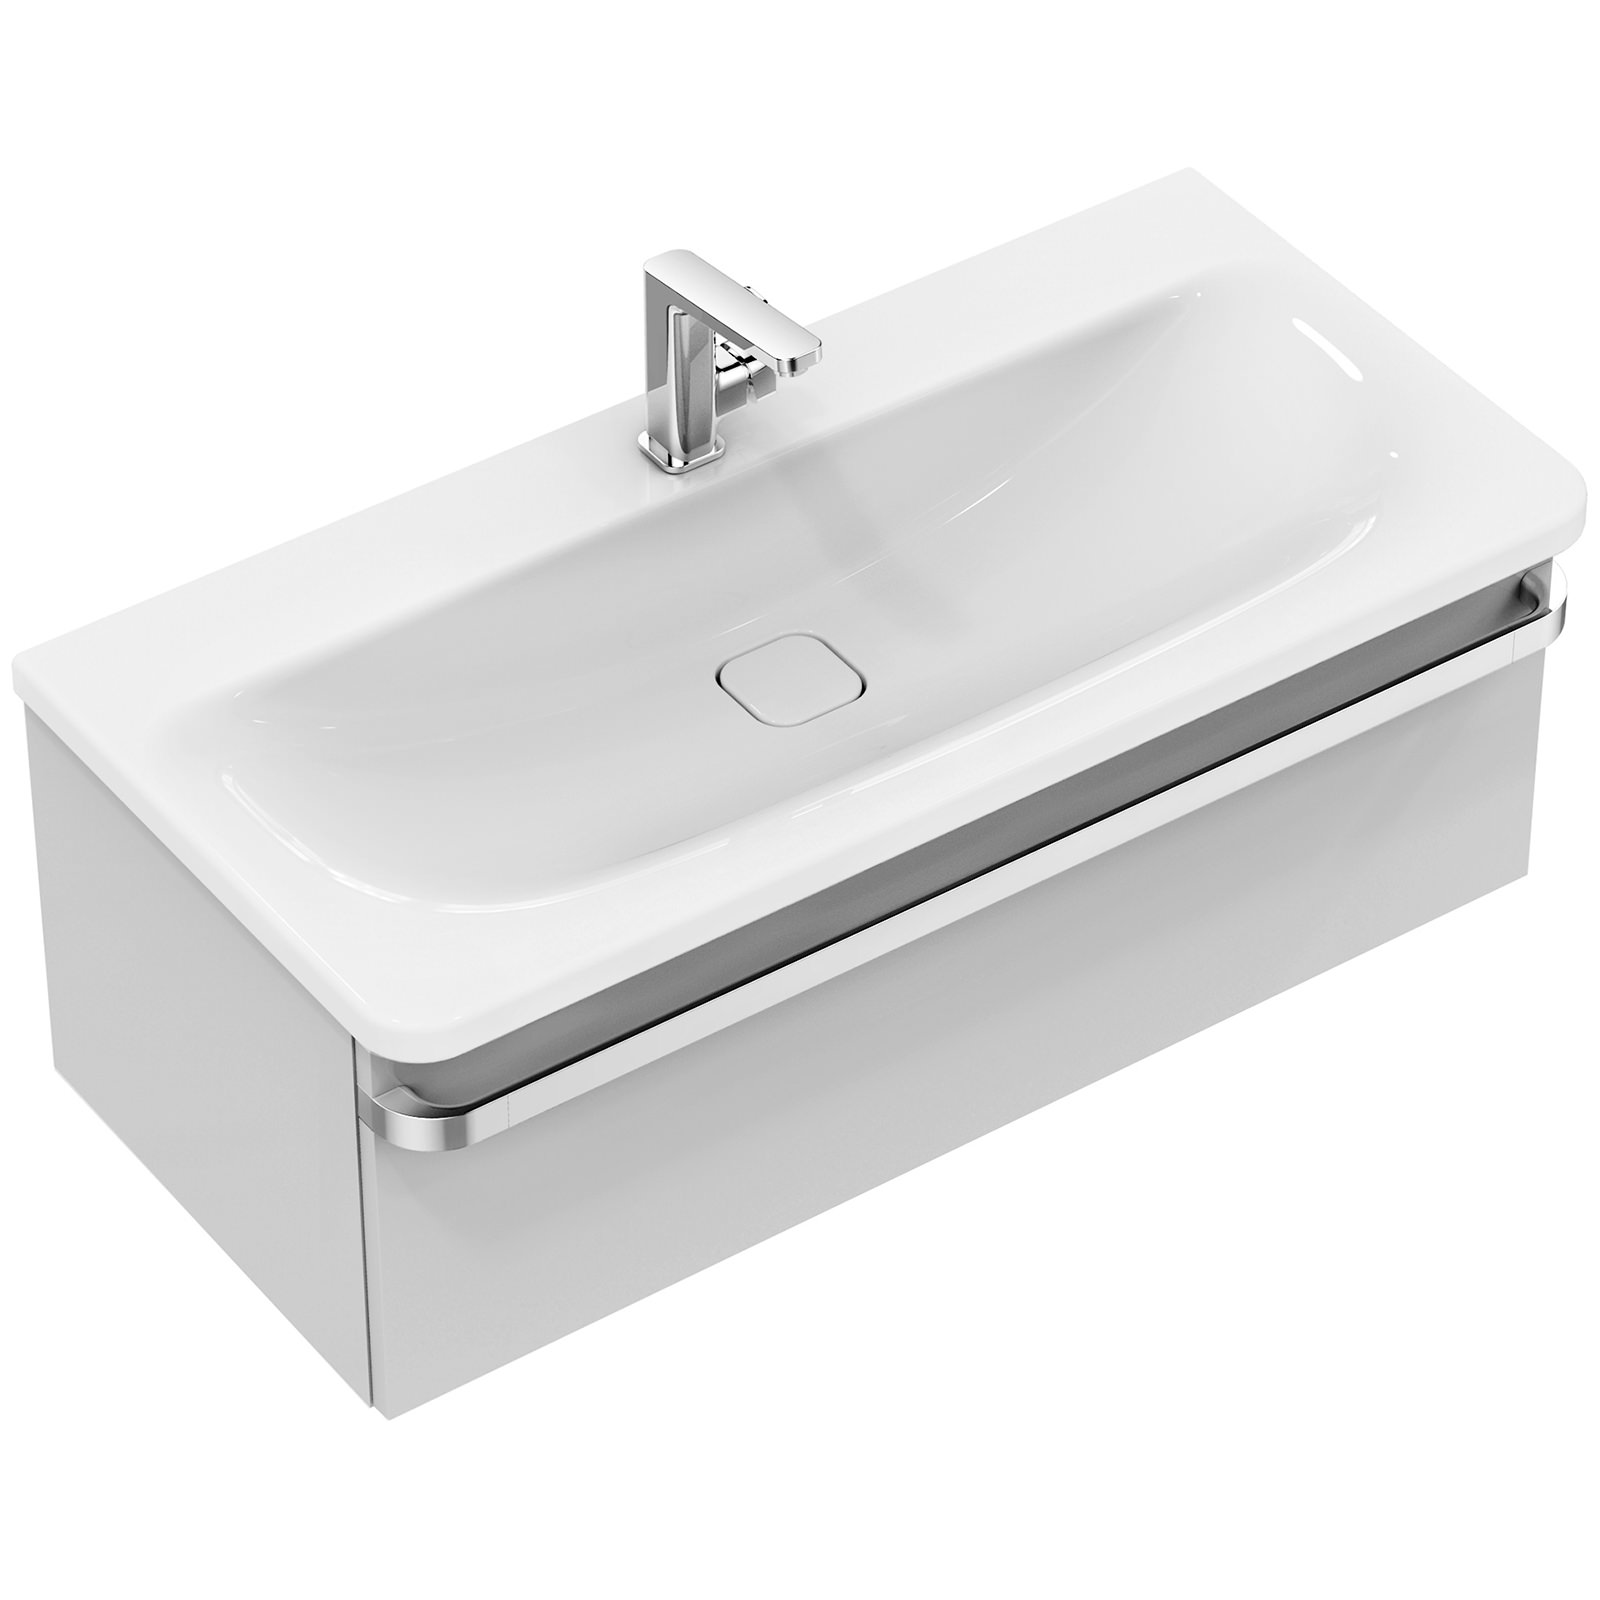 Ideal standard tonic ii 1000mm 1 drawer washbasin unit for 1000mm kitchen drawer unit